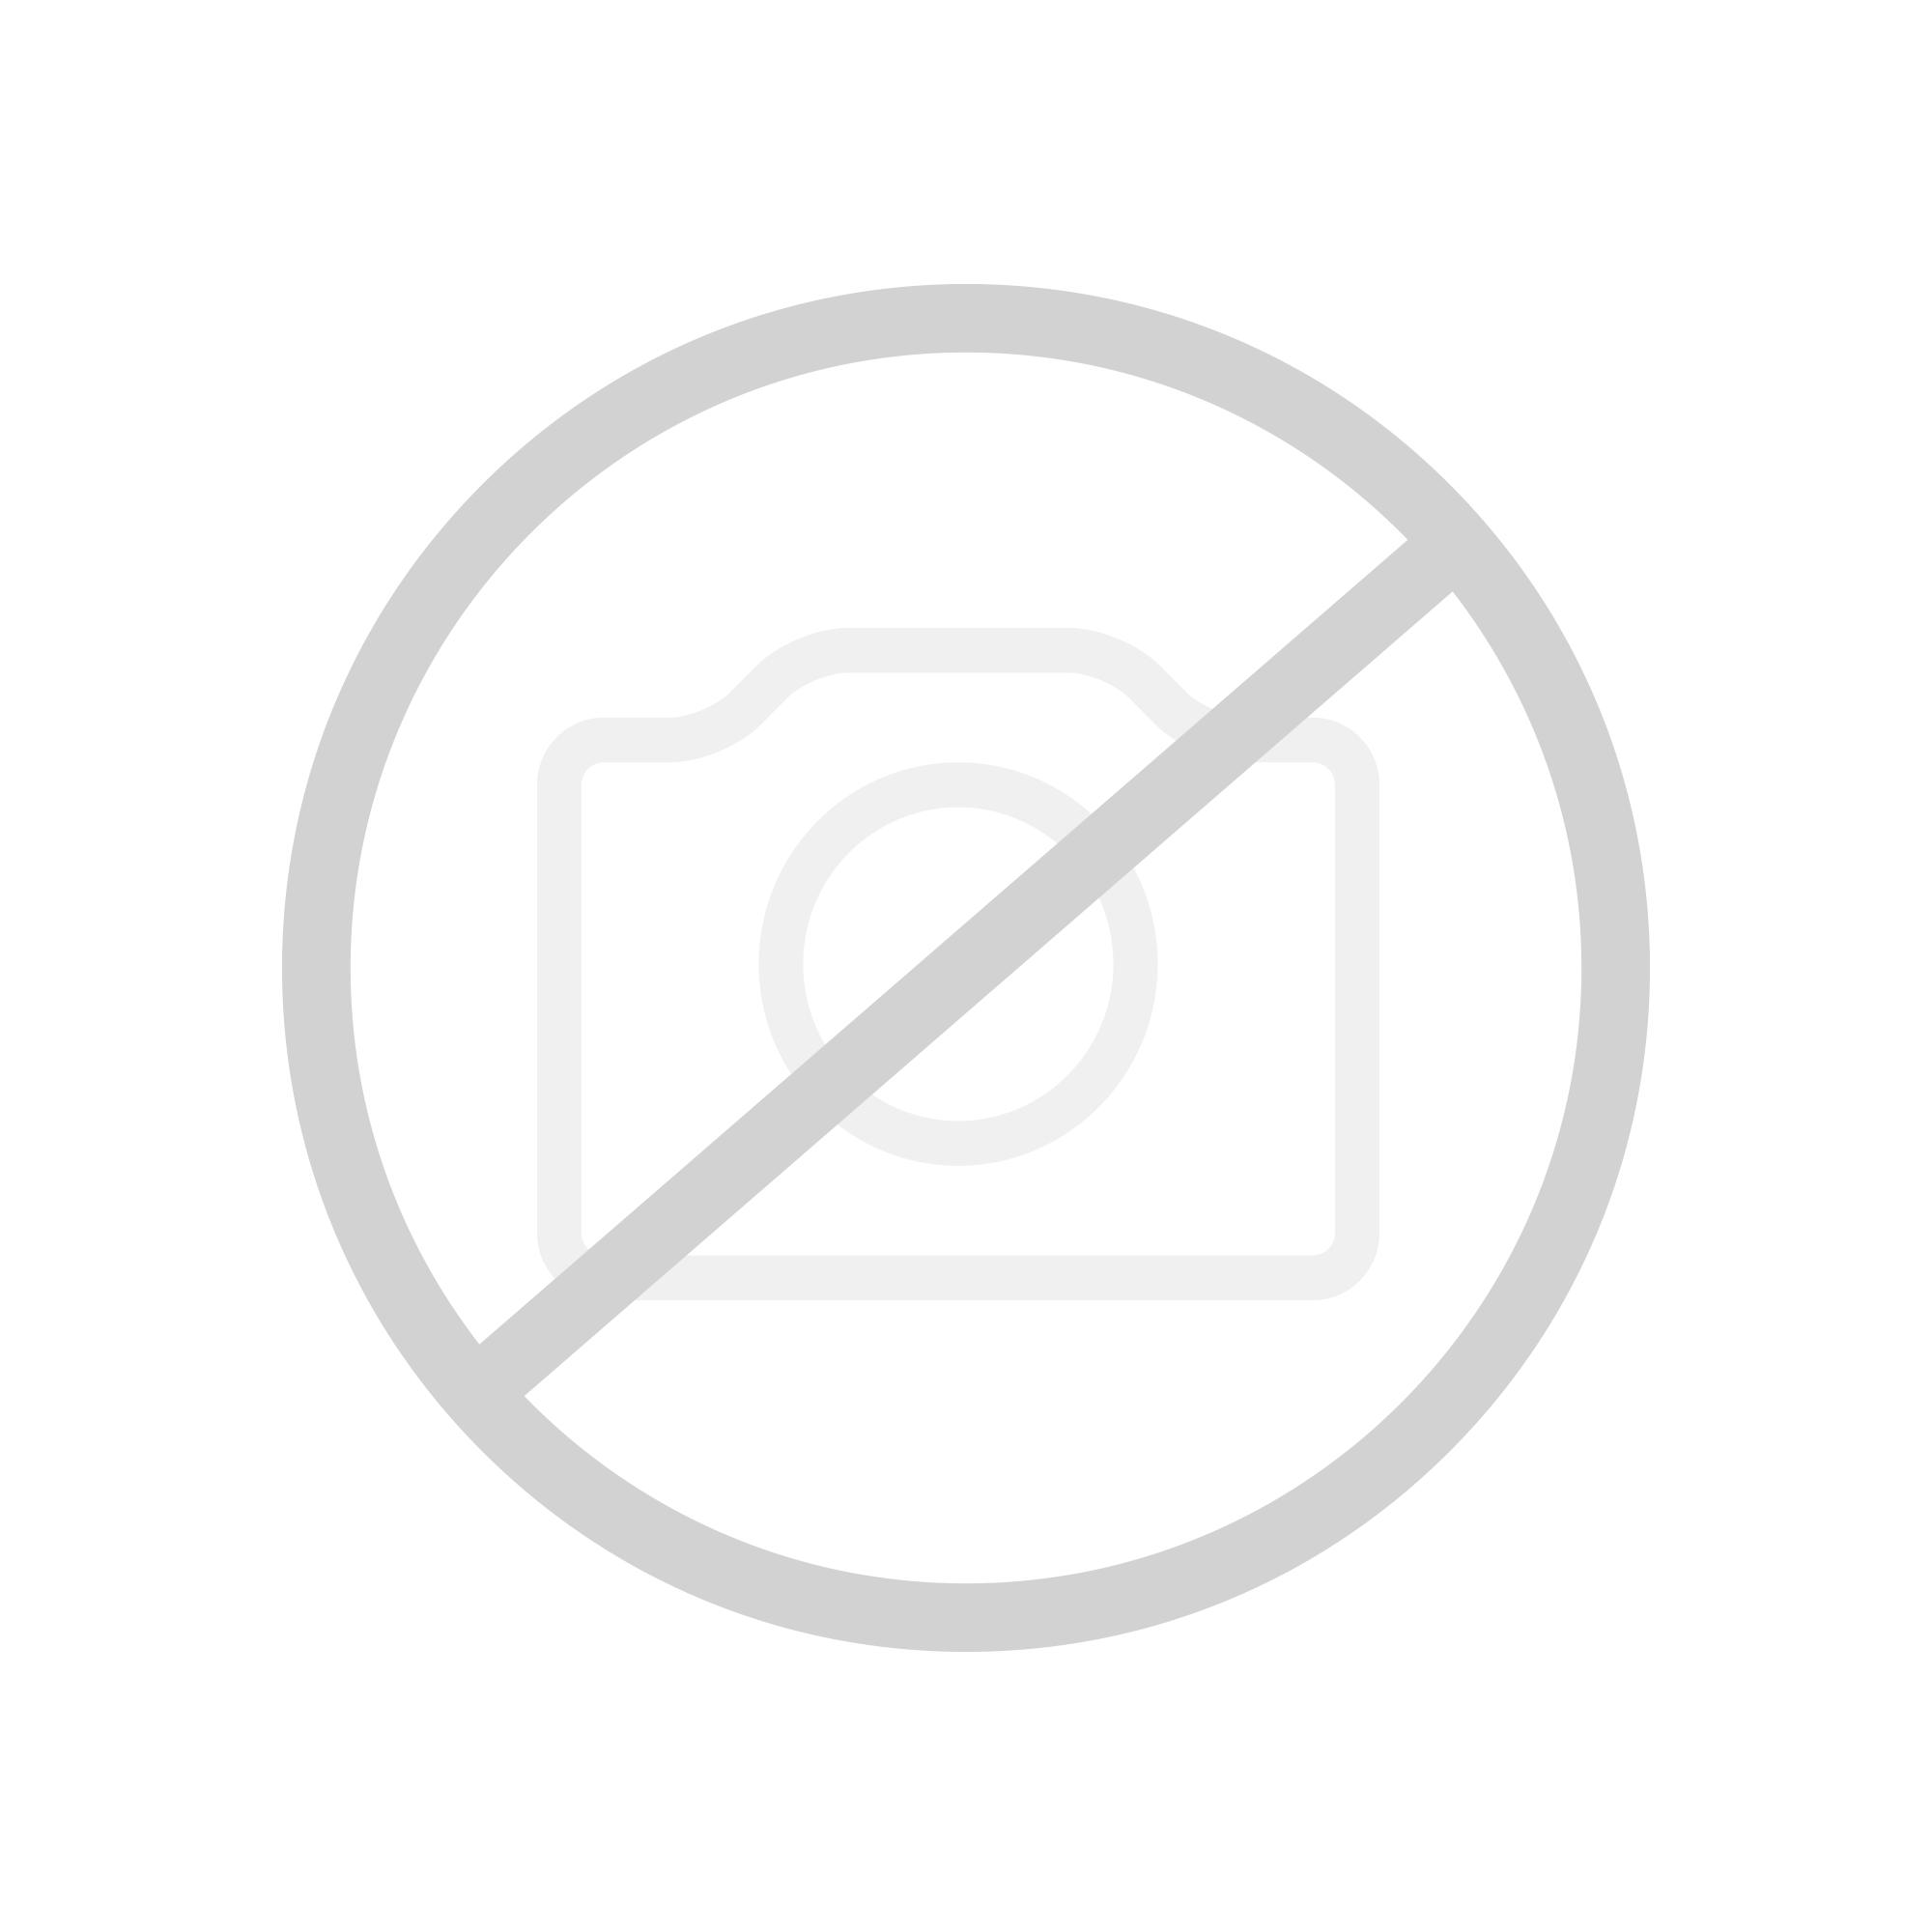 Damixa Rowan Einhebel-Bidetarmatur mit Ablaufgarnitur